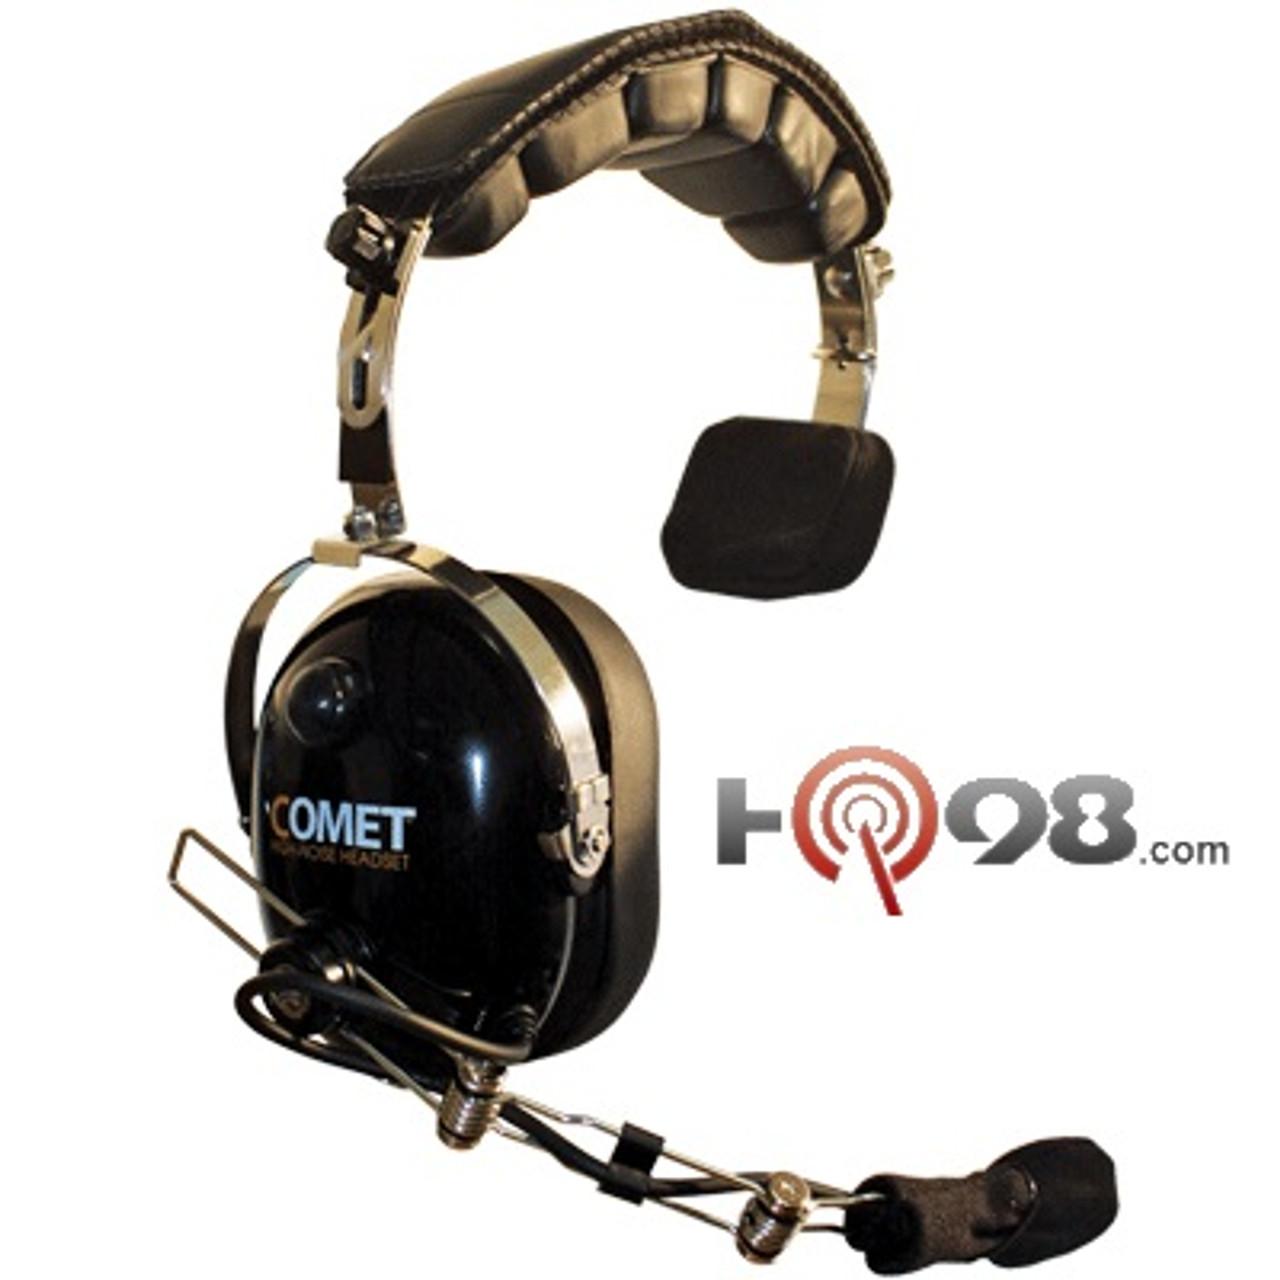 Speaker mic Icom F3001 F4001 F3011 F4011 F3021S F4021S F3101D F4101D F11 F21 F24